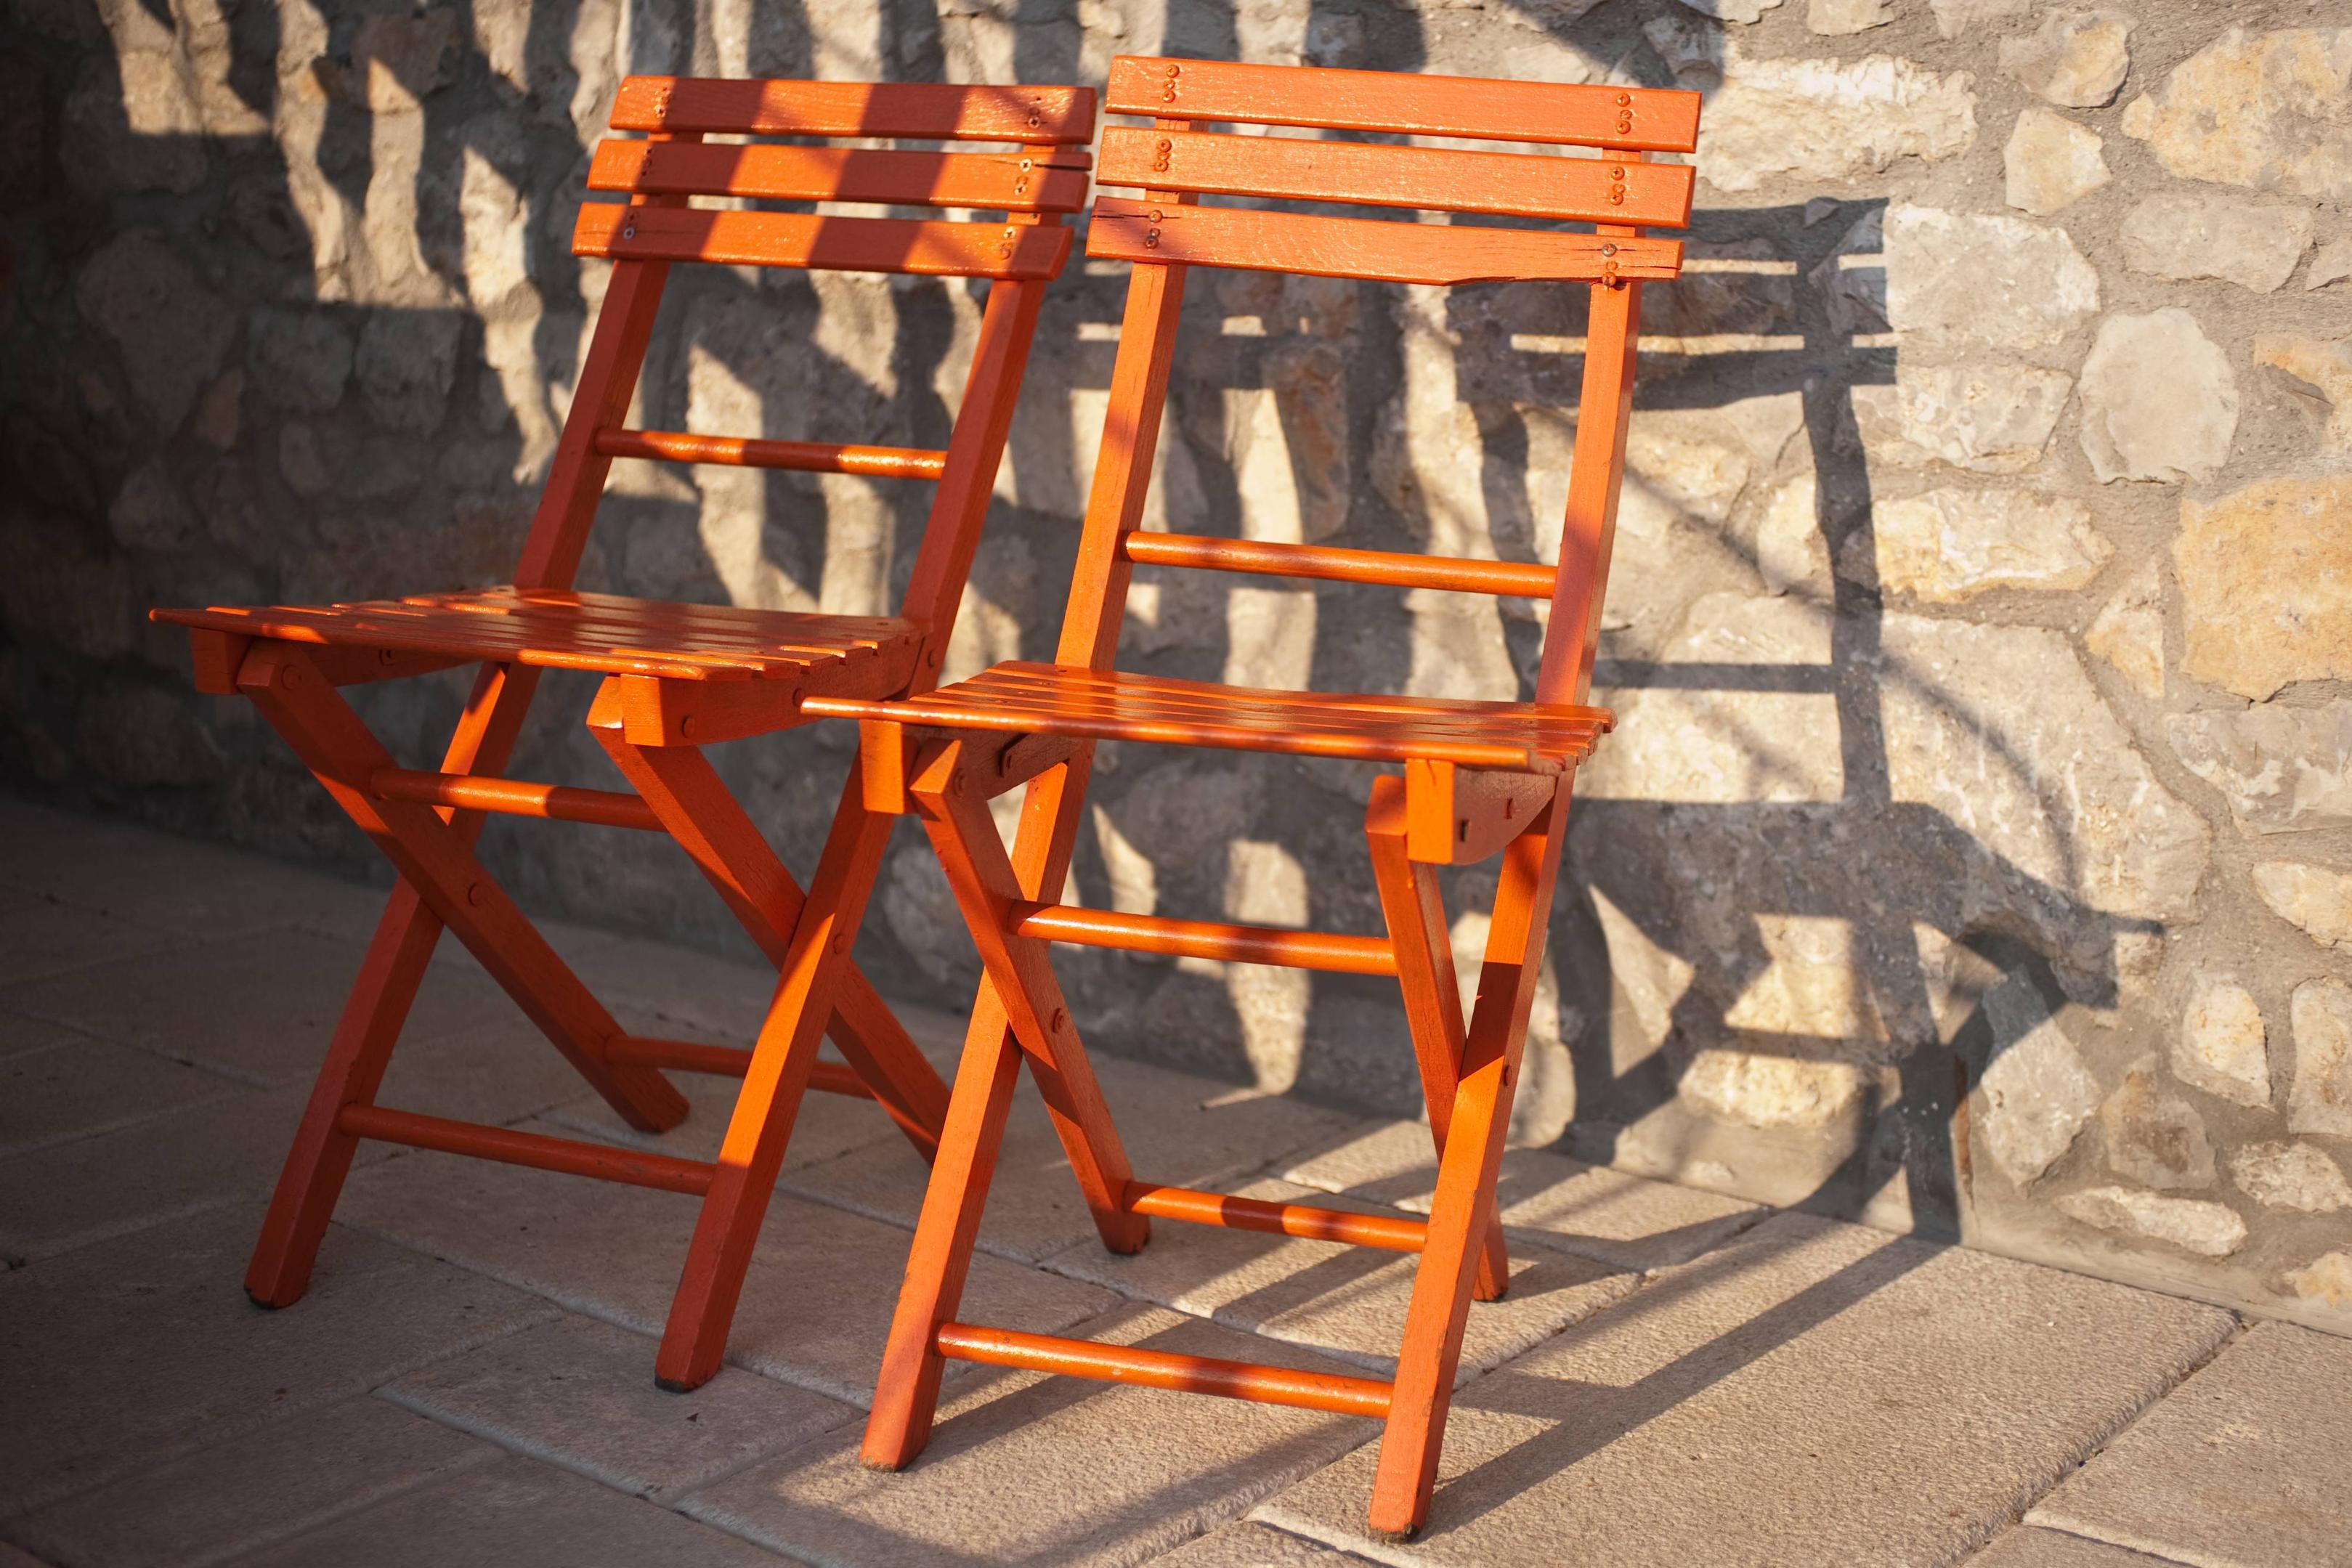 sedan chair rental padded butterfly rentals on long island longisland